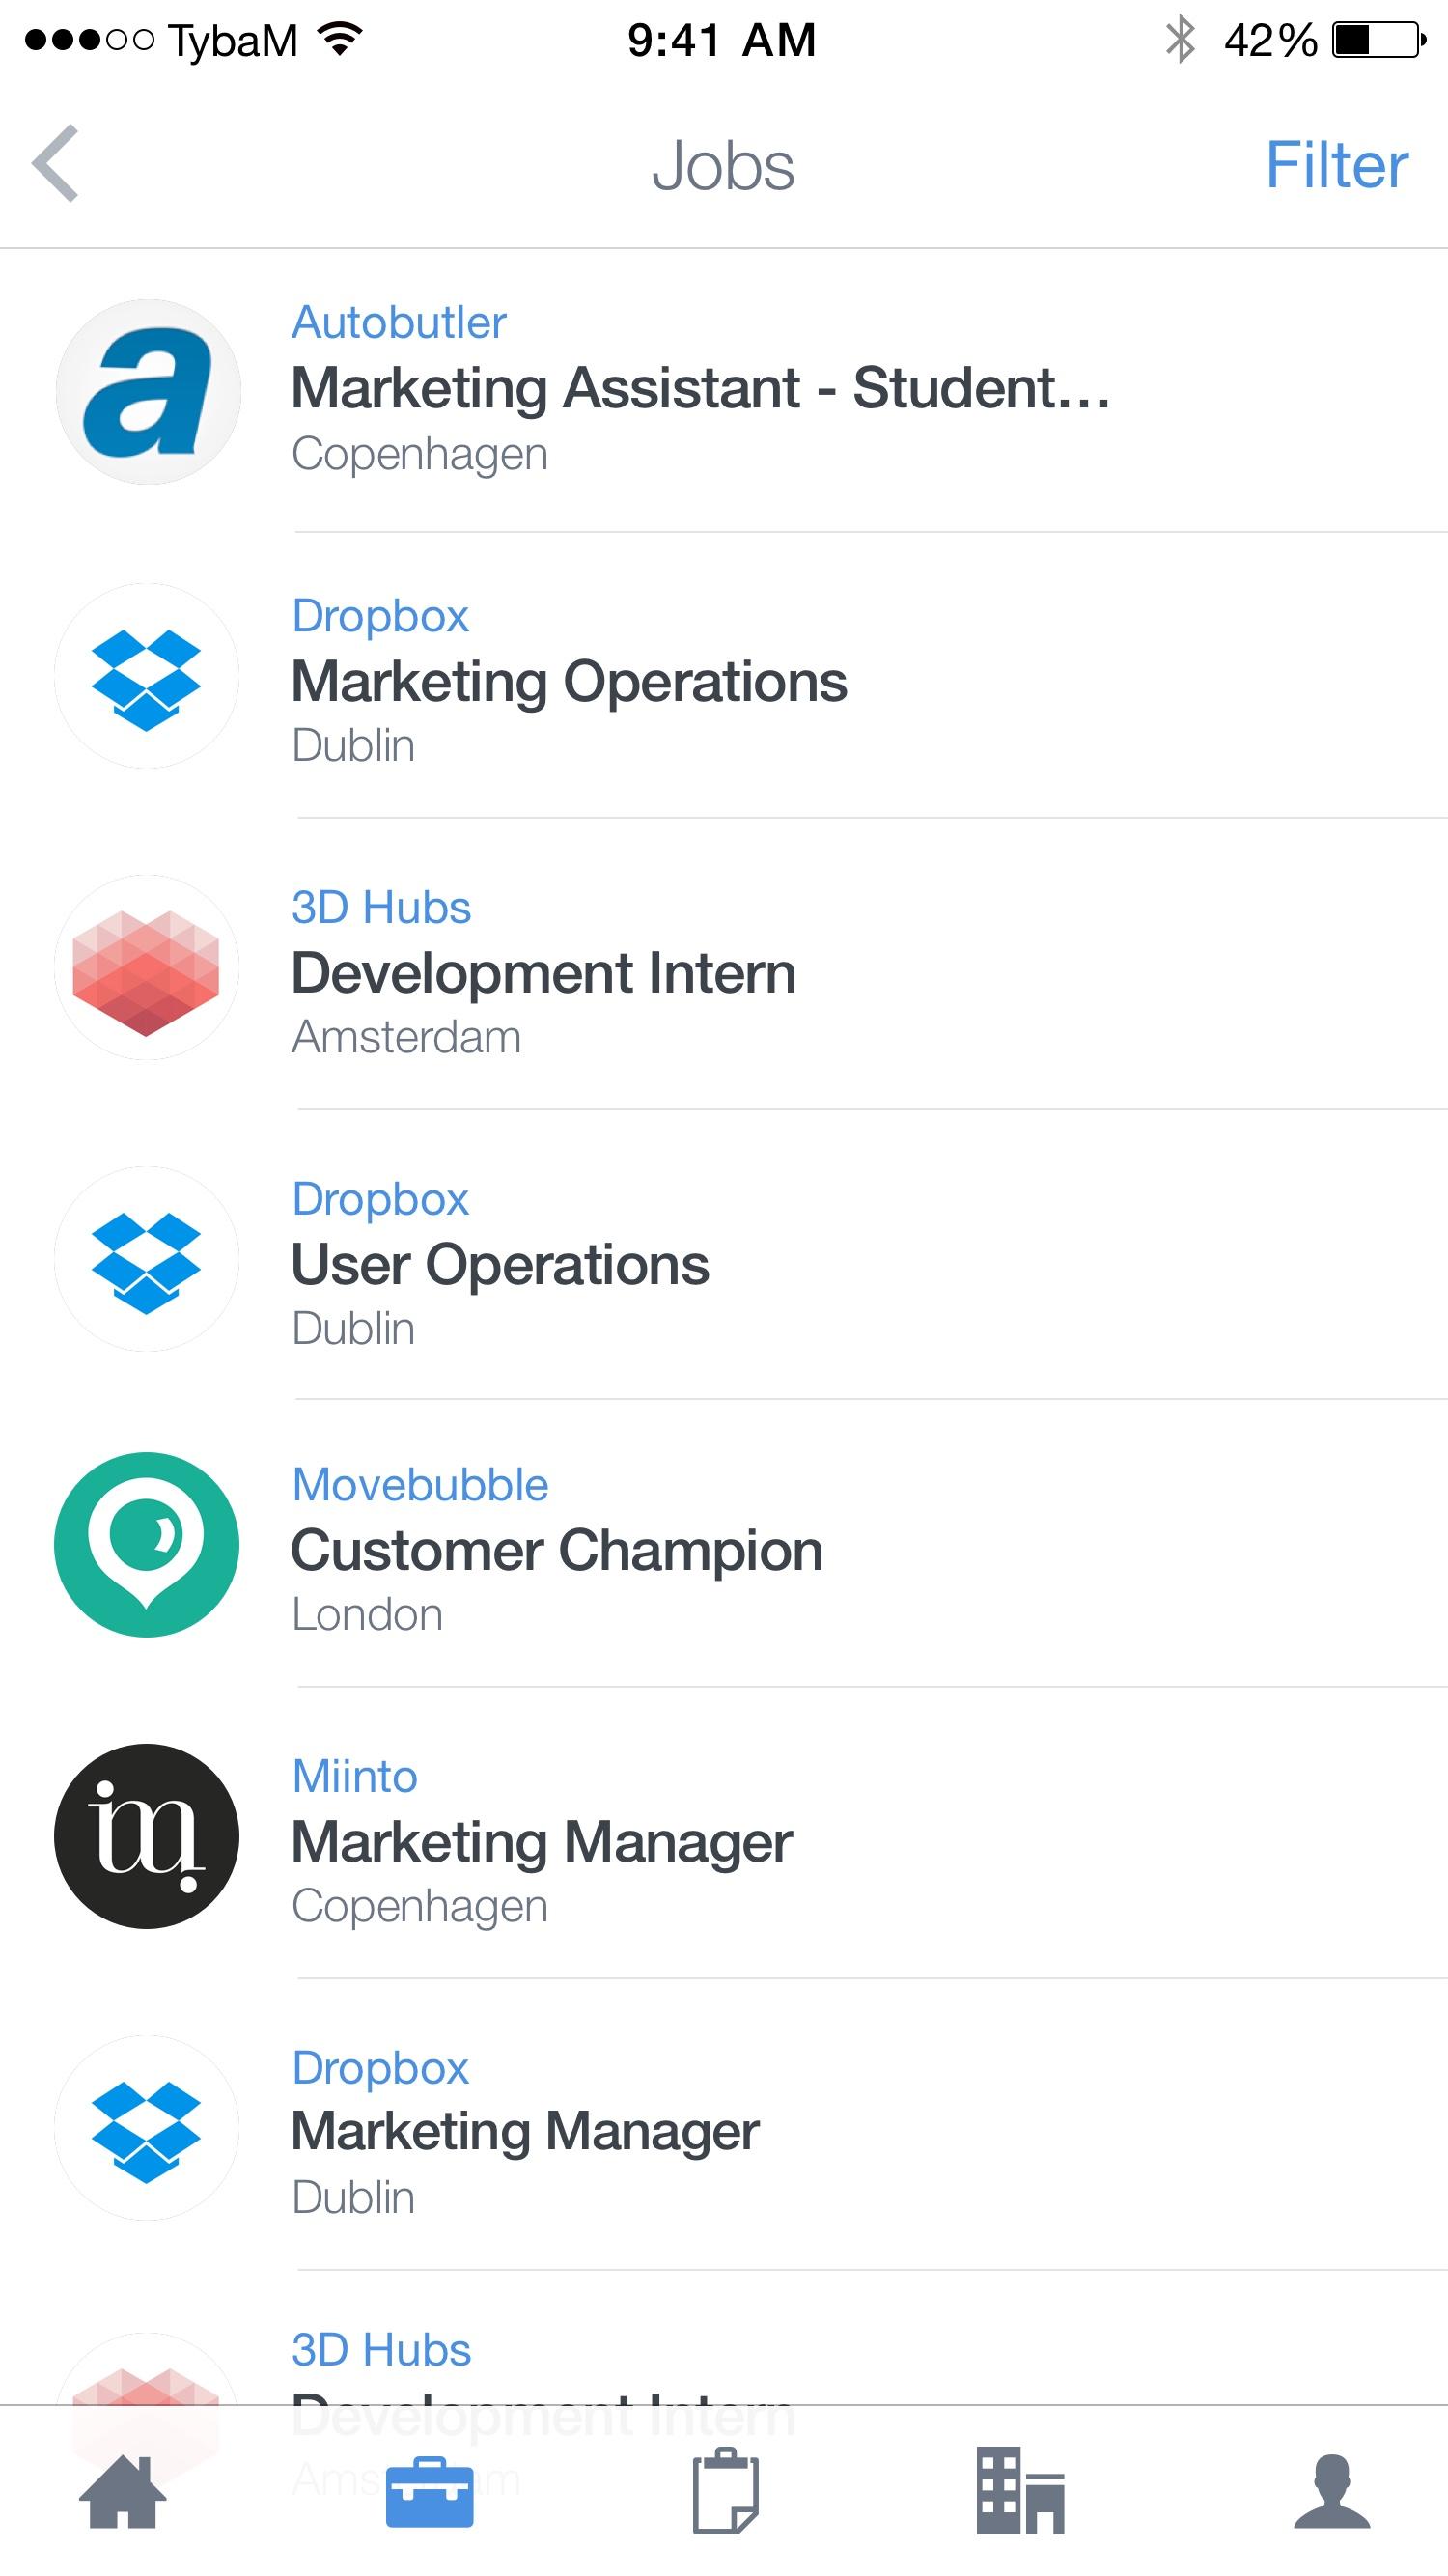 Jobs – List